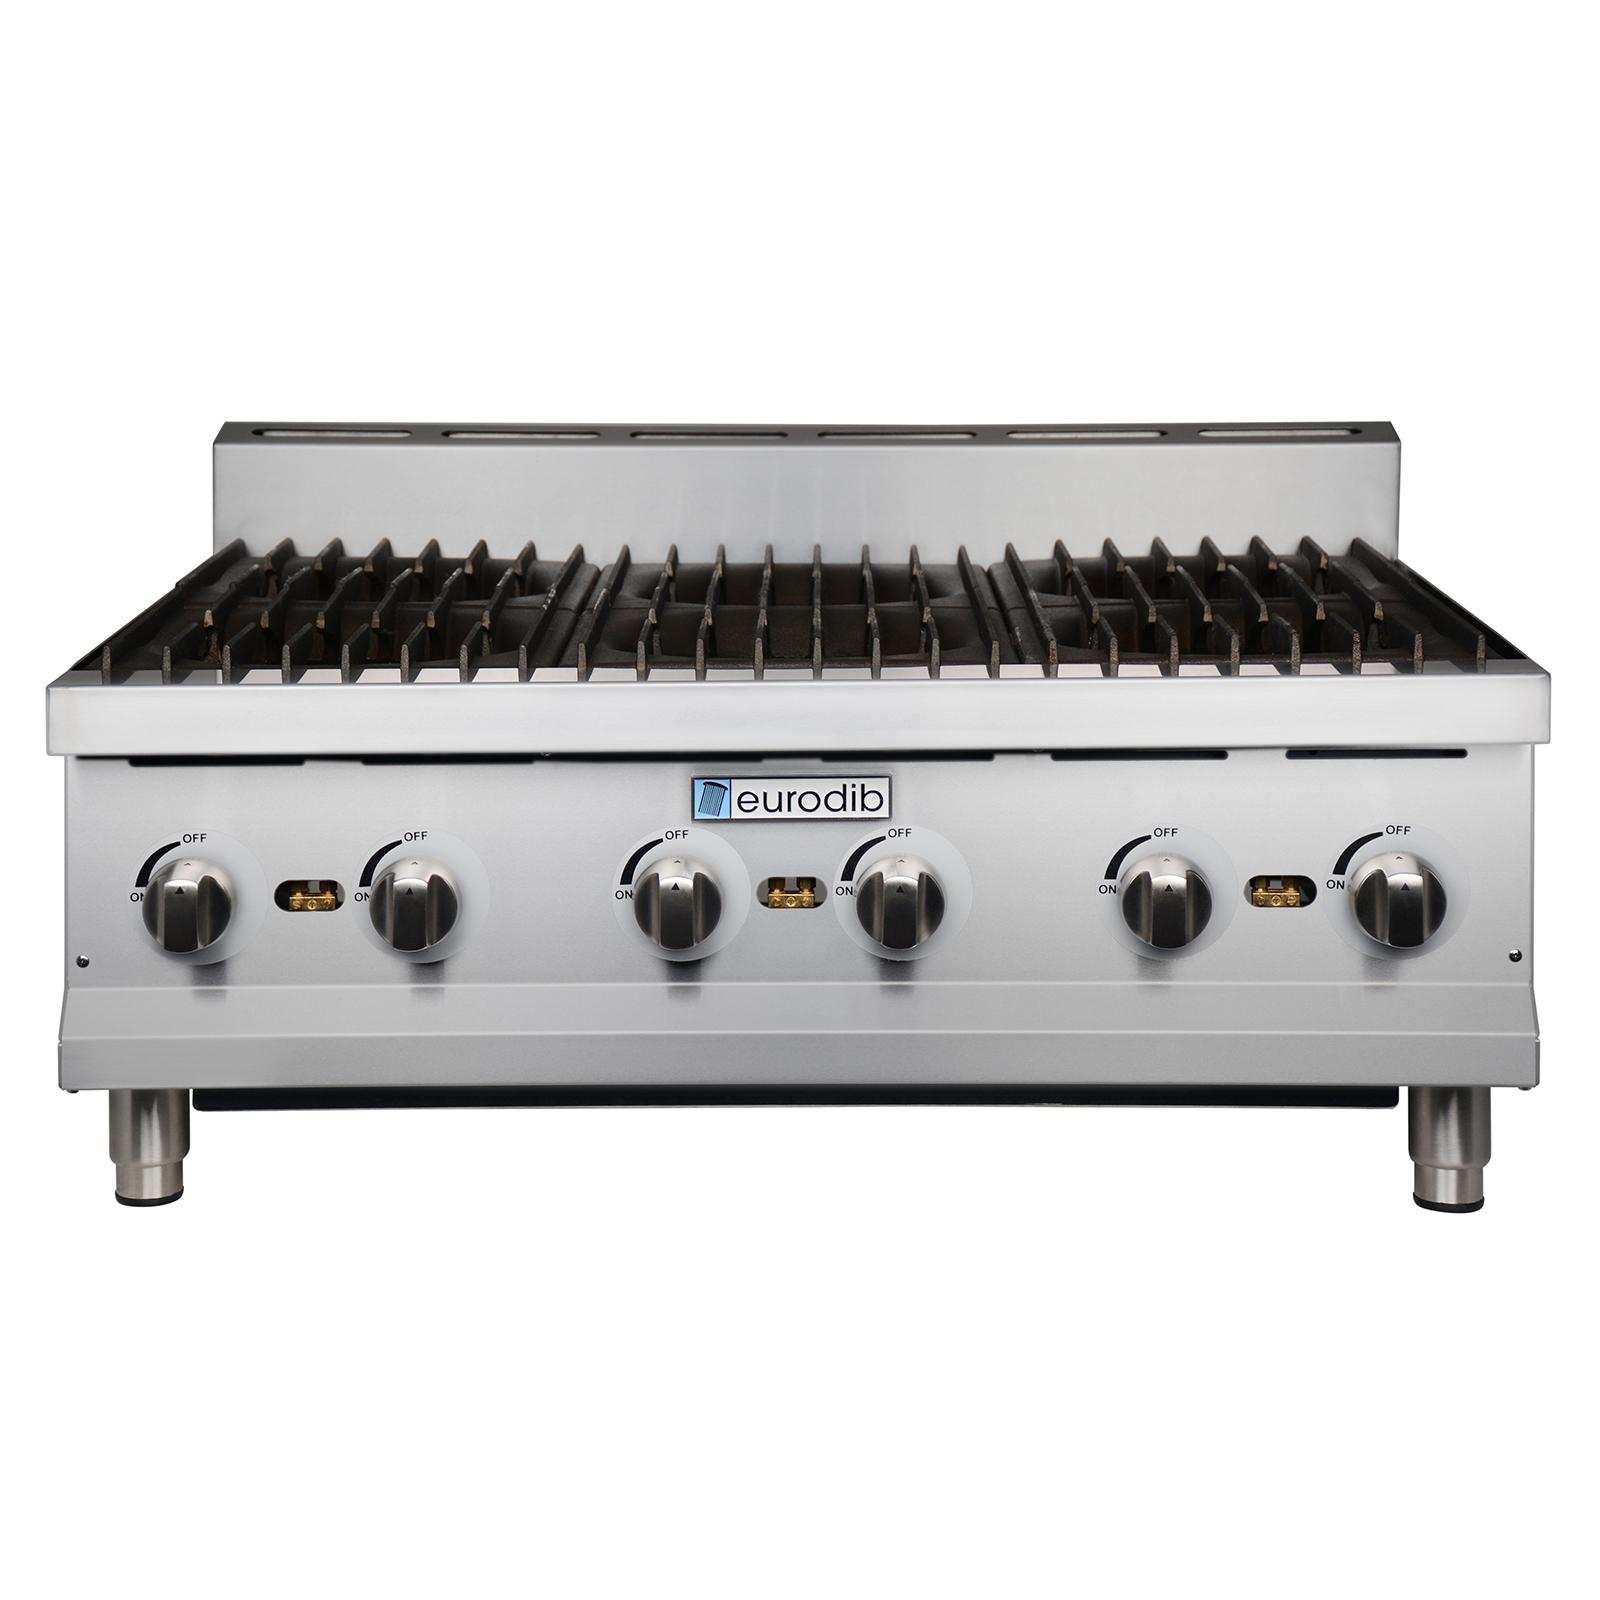 Eurodib USA T-HP636 hotplate, countertop, gas